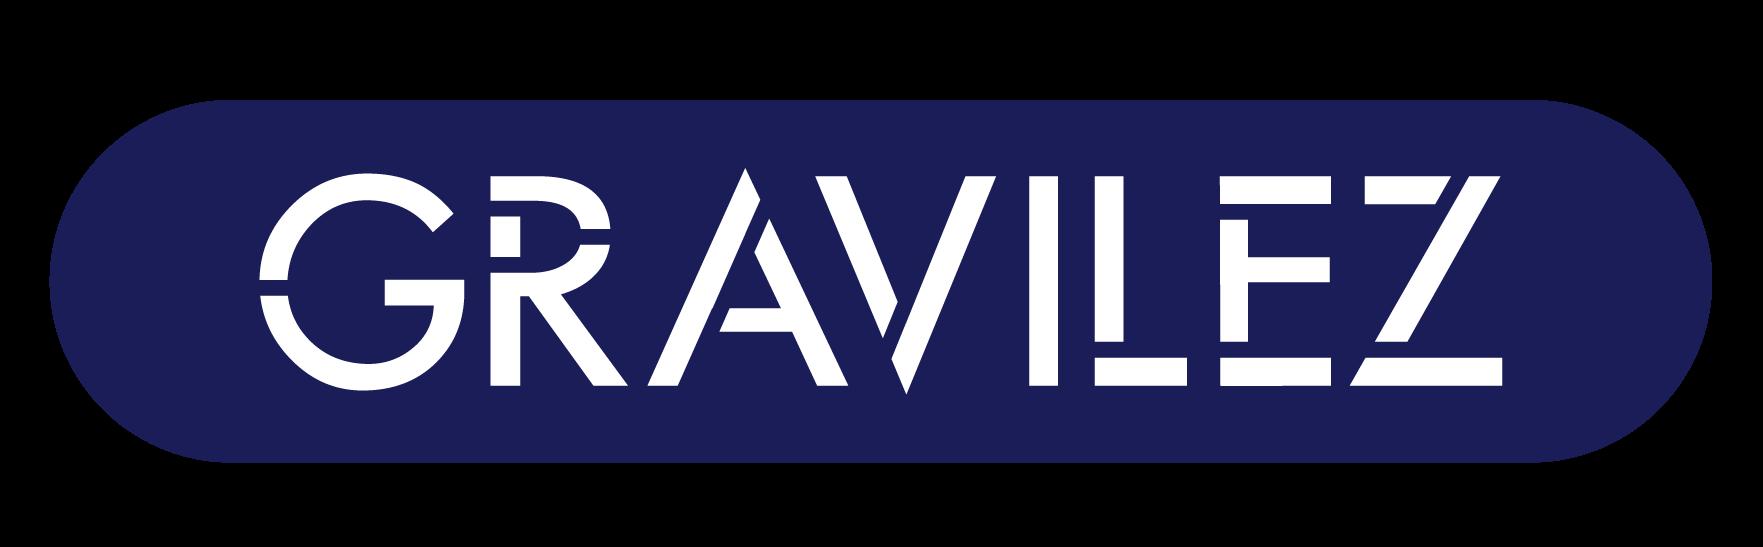 GRAVILEZ